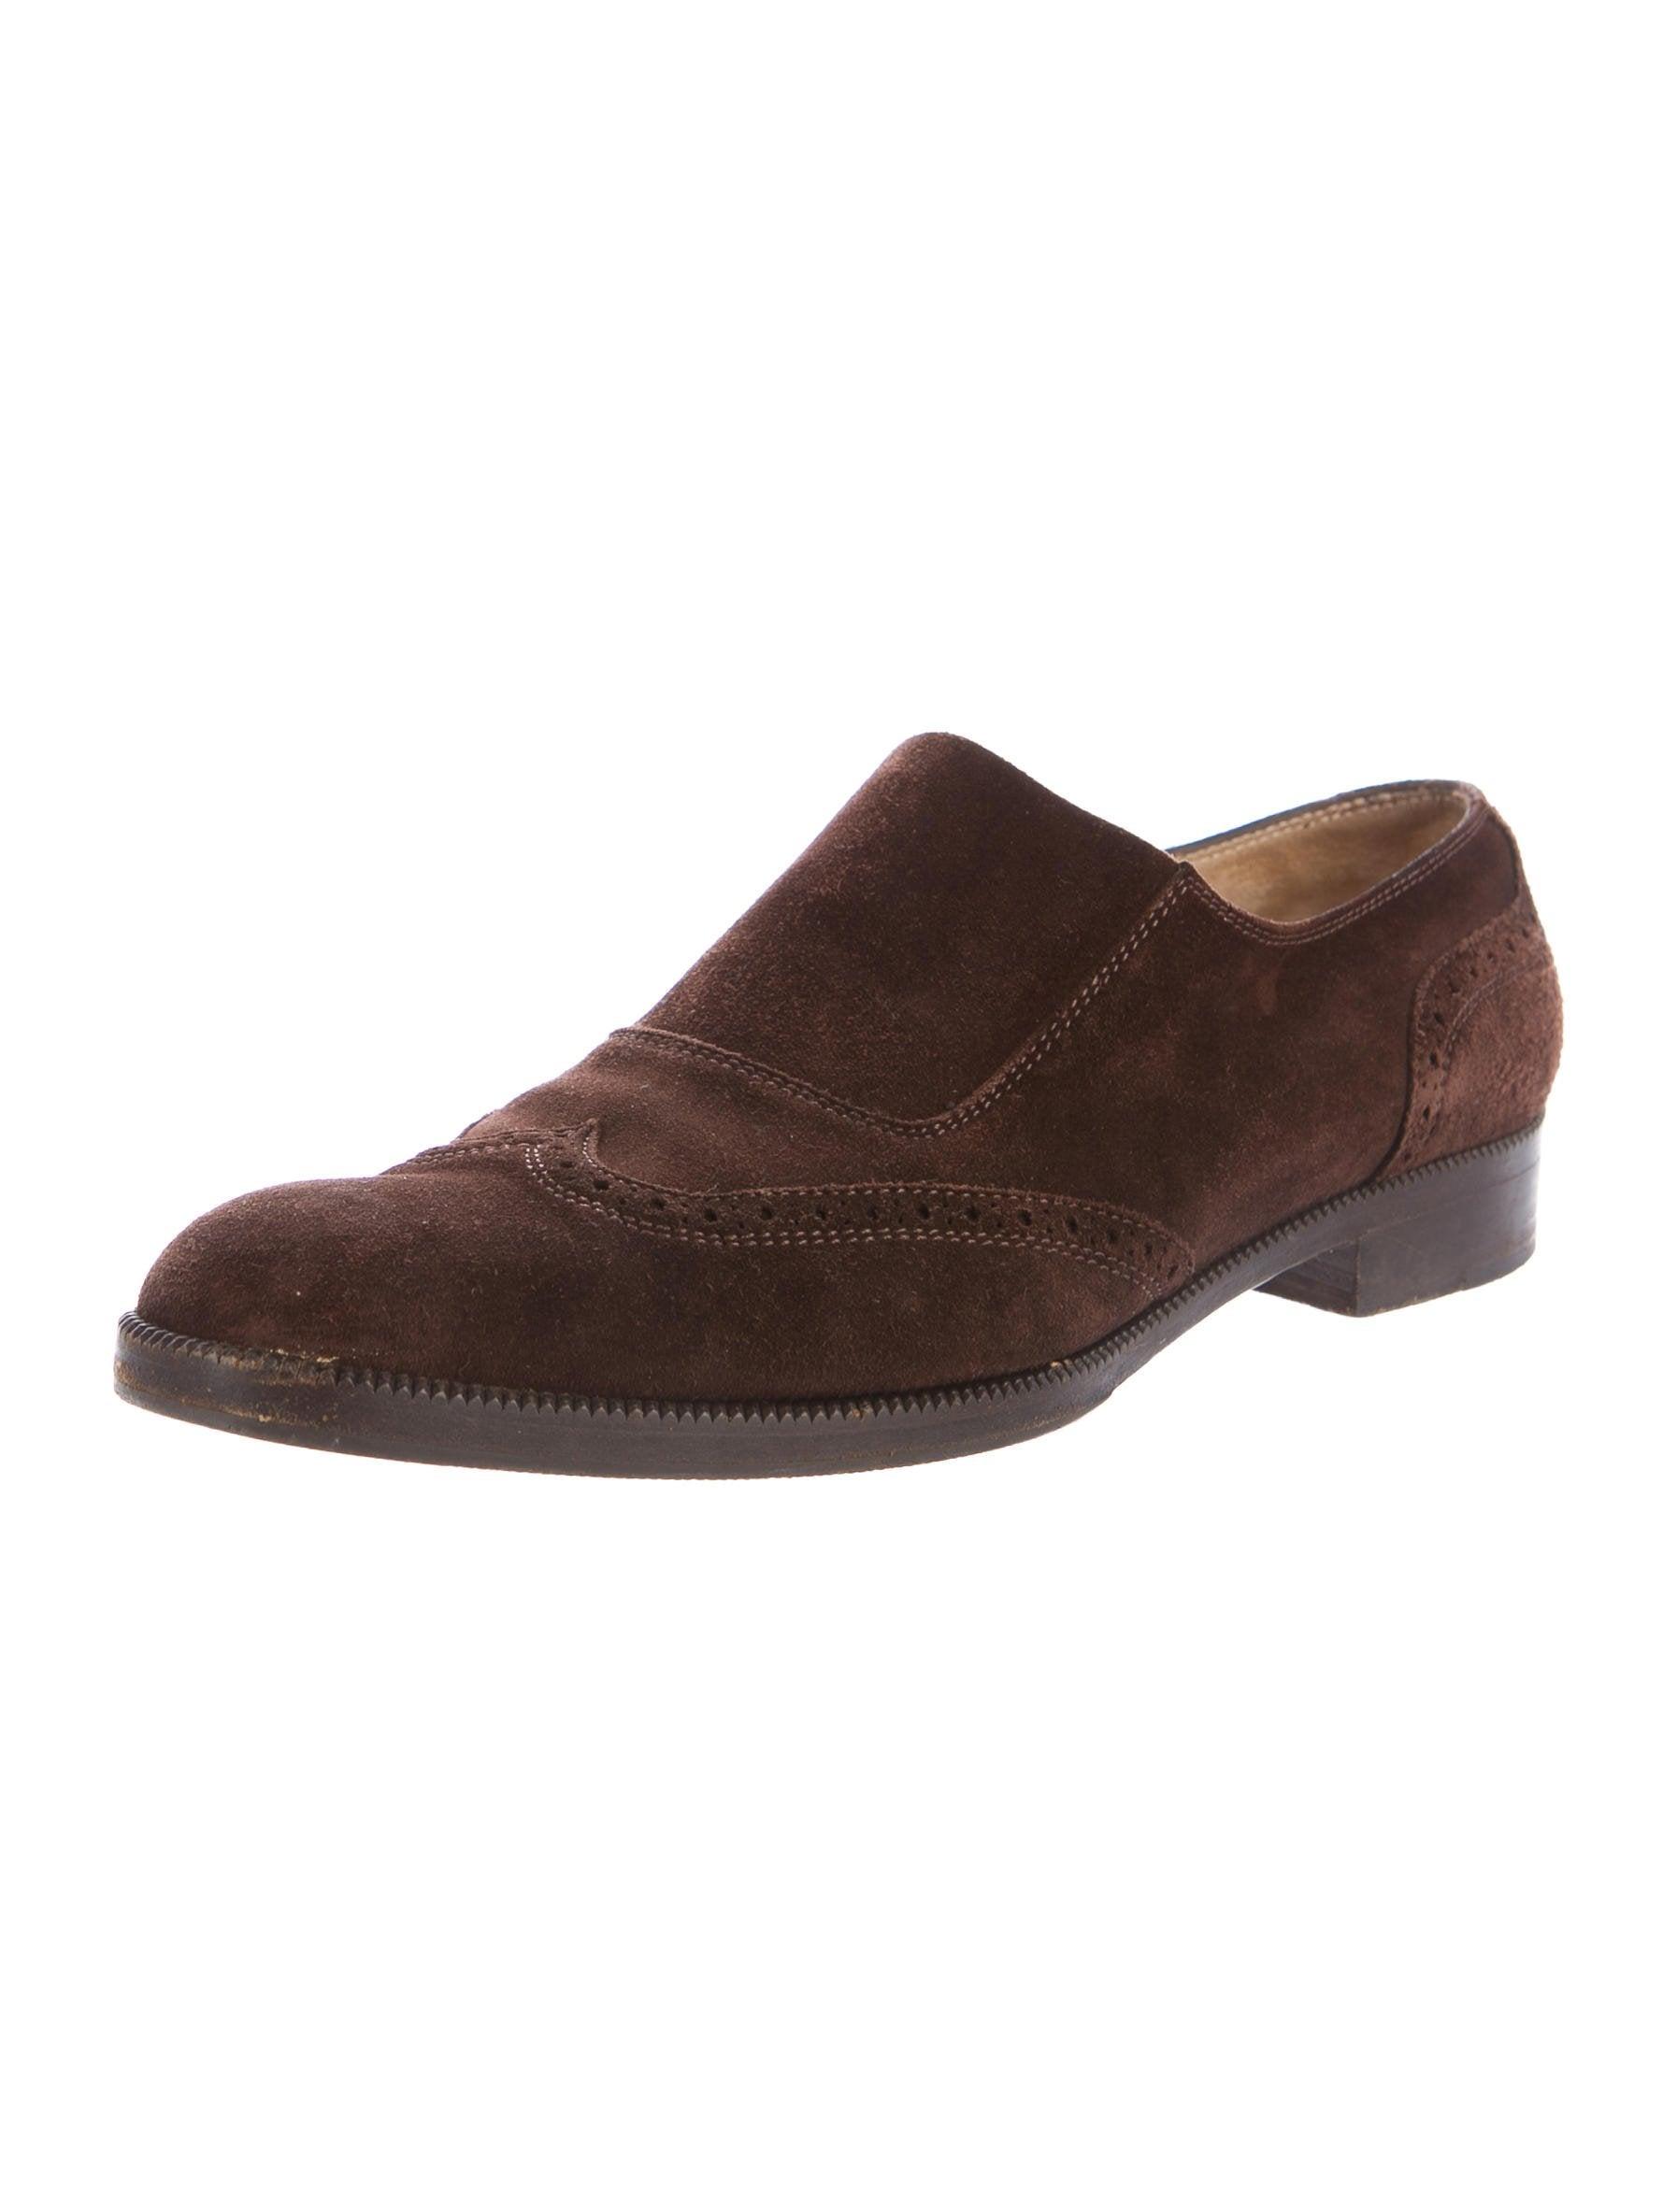 salvatore ferragamo sport suede slip on loafers shoes